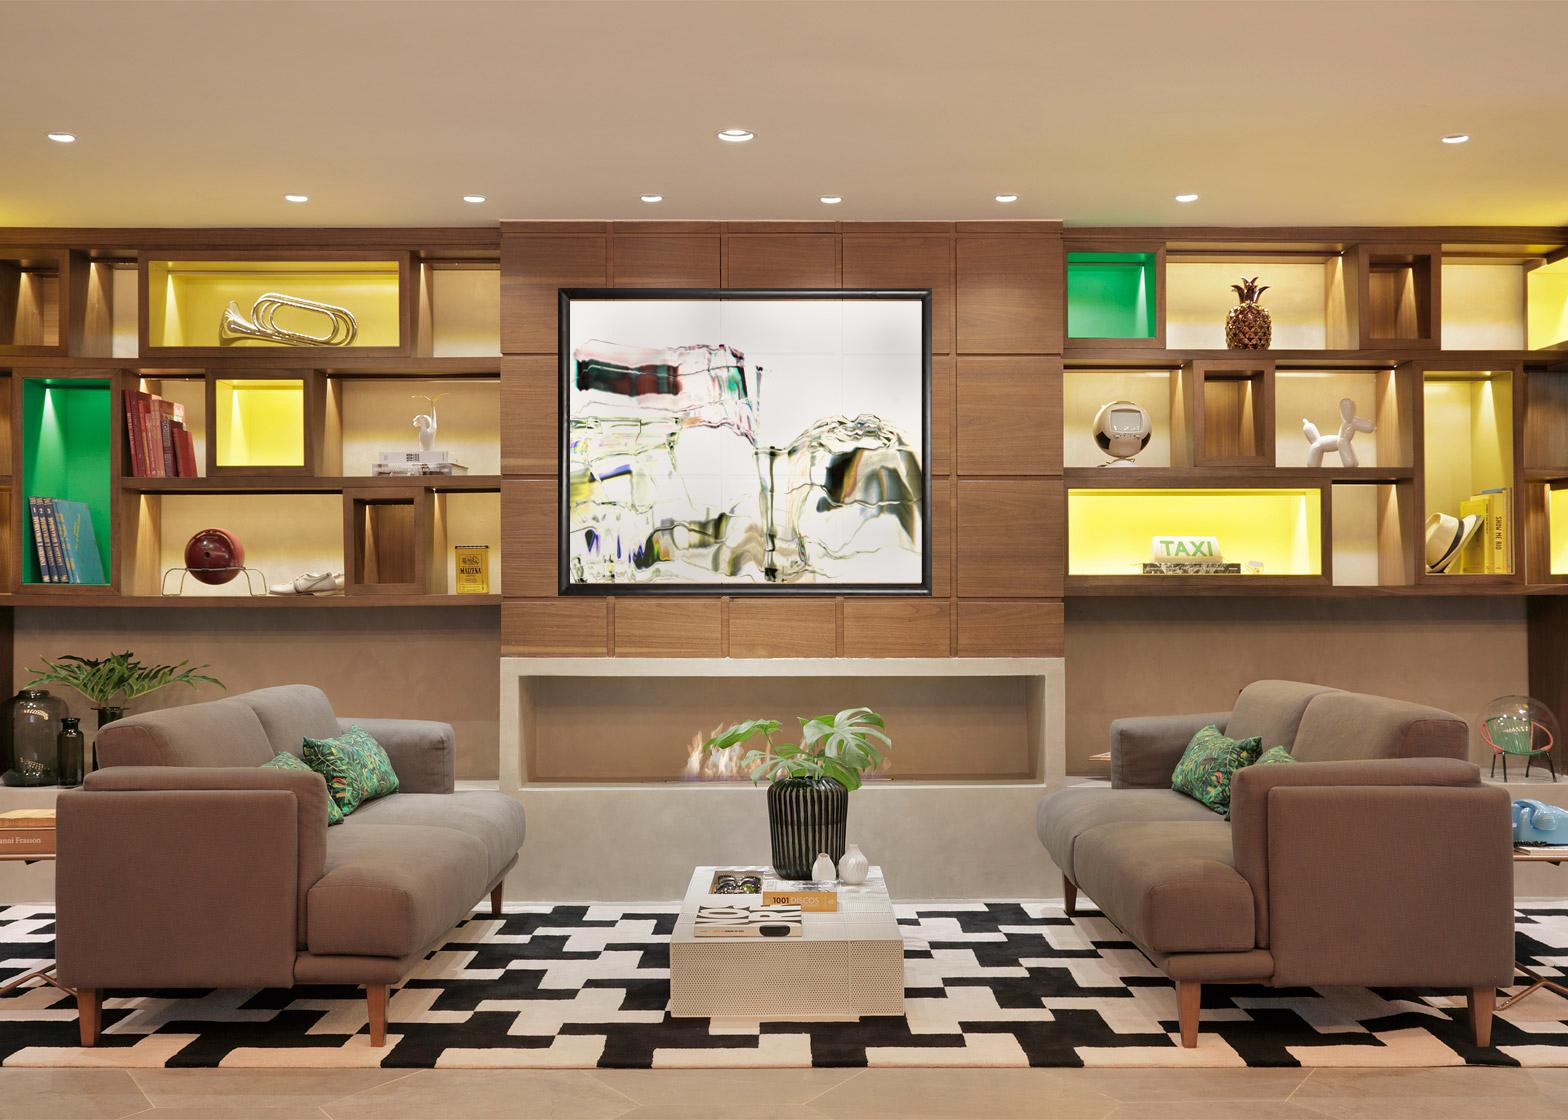 yoo2-hotel-tropicalisation-melina-romano_dezeen_1568_3.jpg